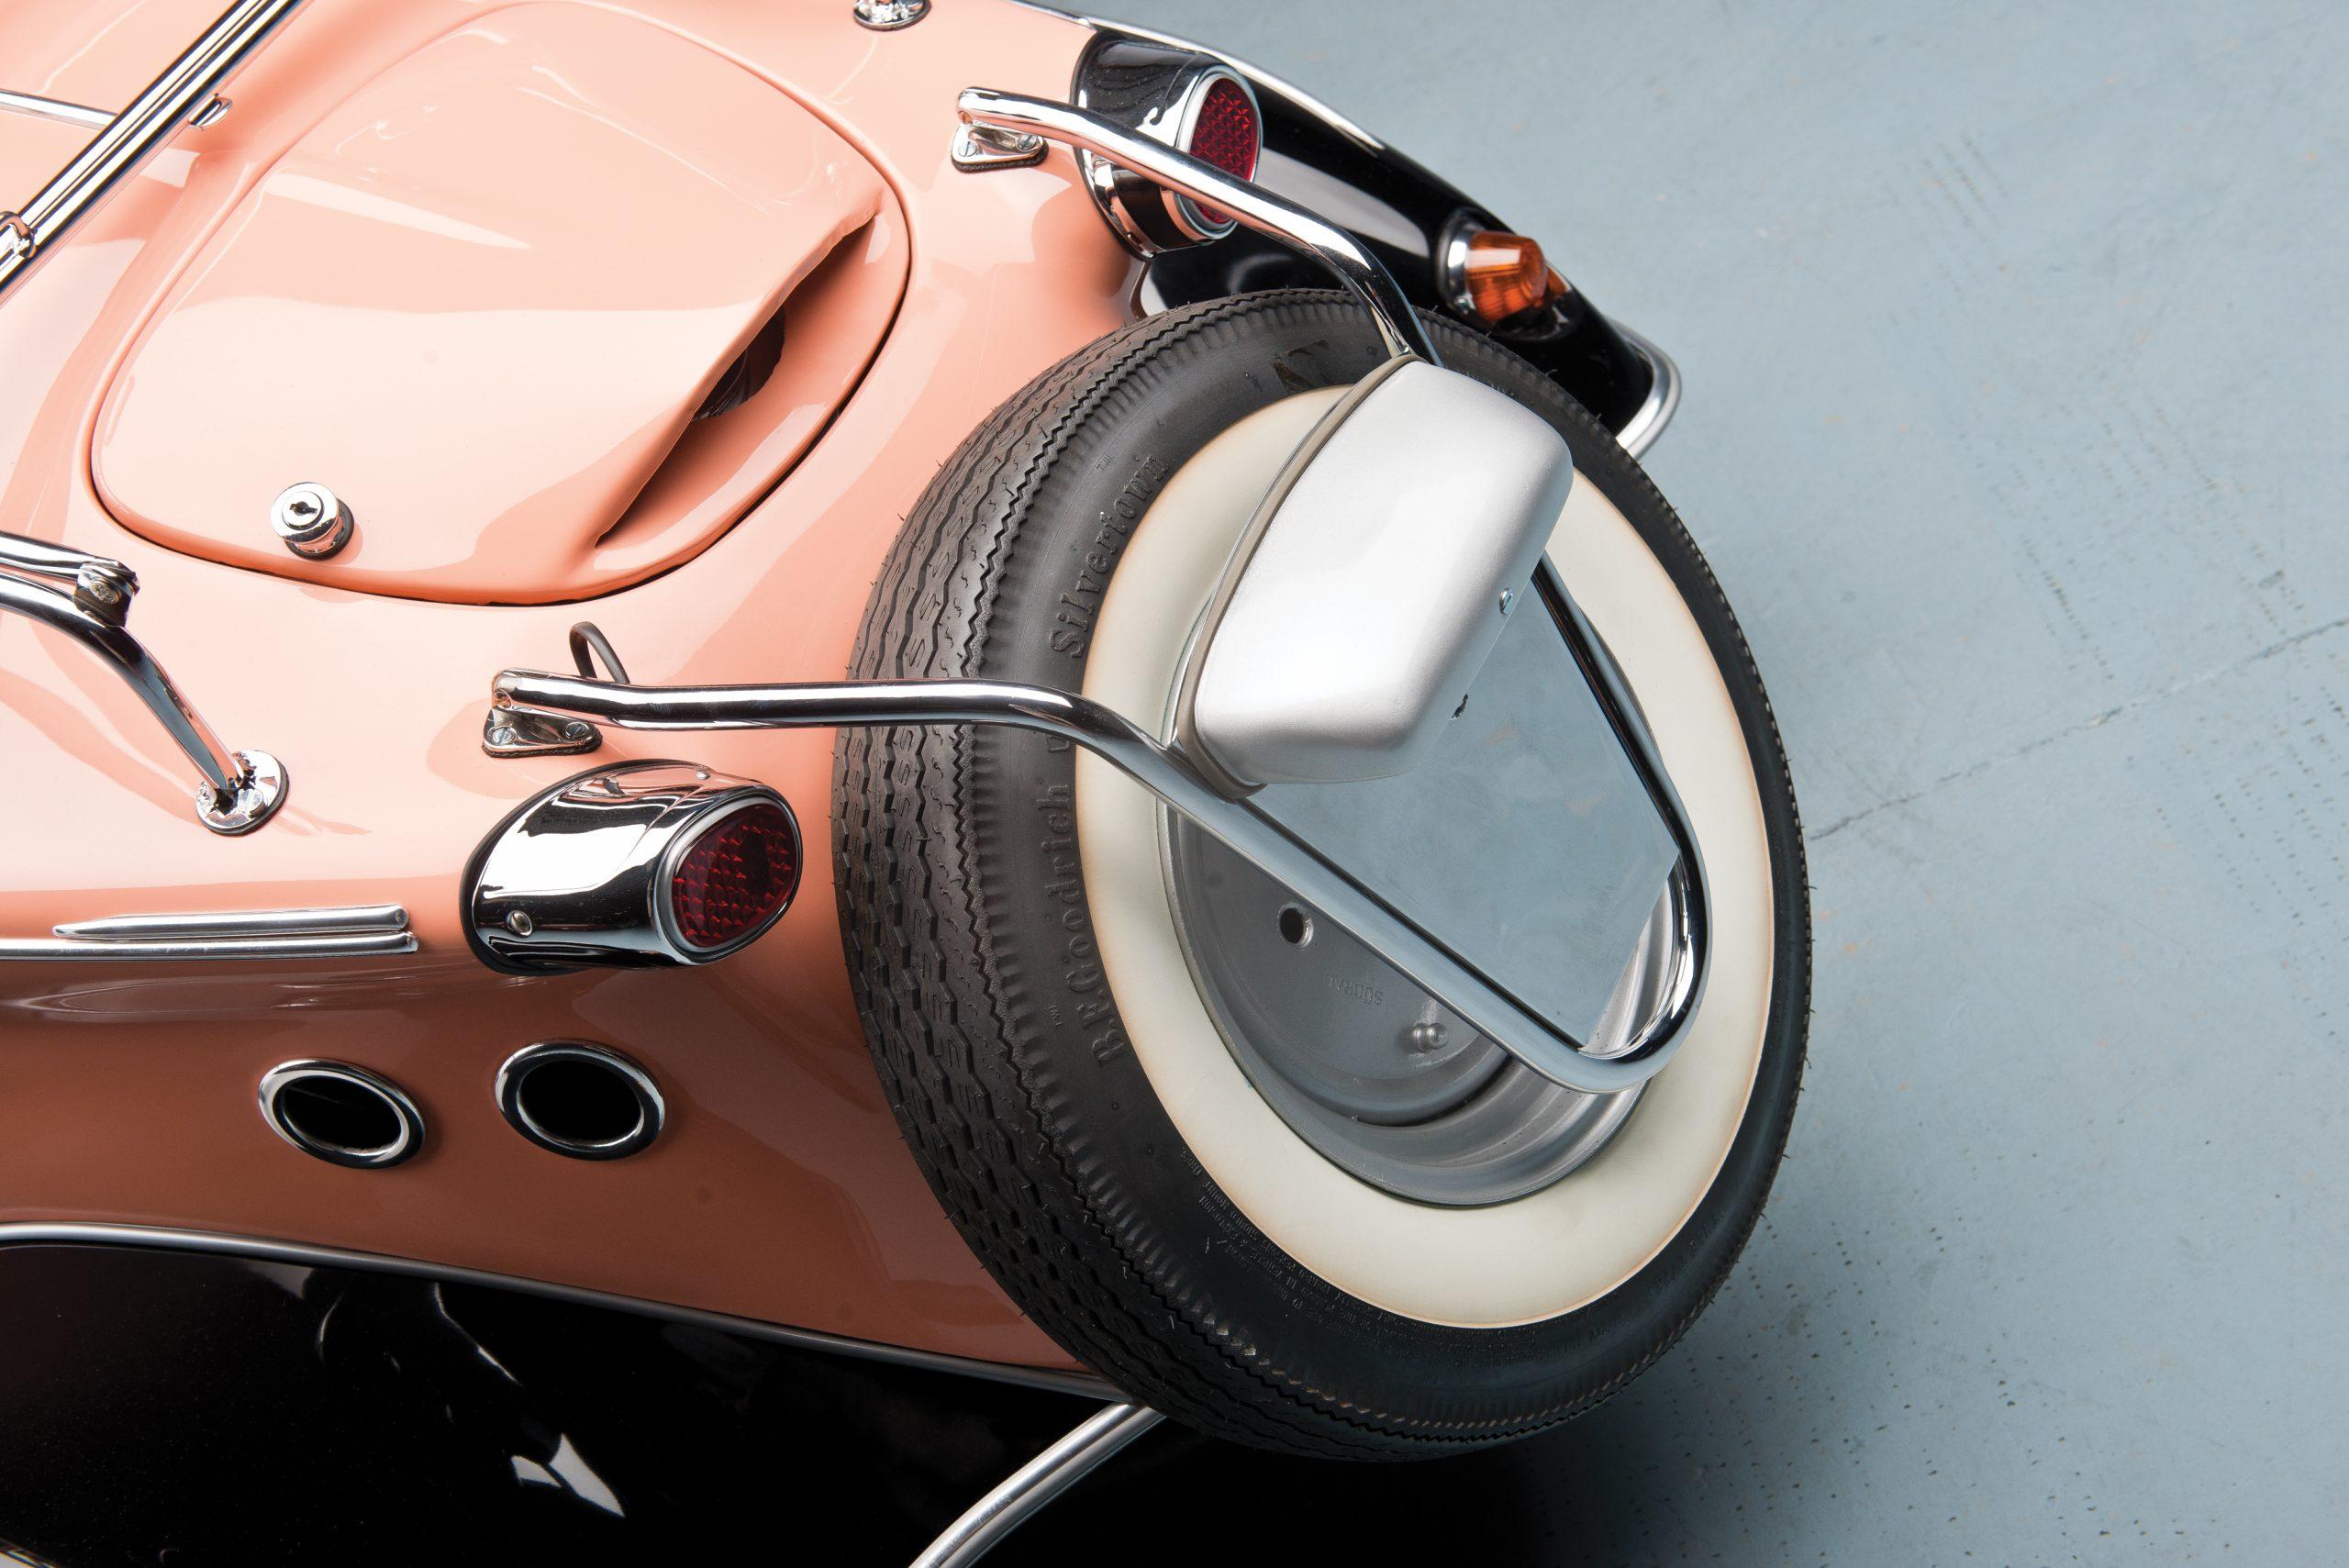 1958 F.M.R. Tg 500 'Tiger' 2013 bruce weiner microcar auction